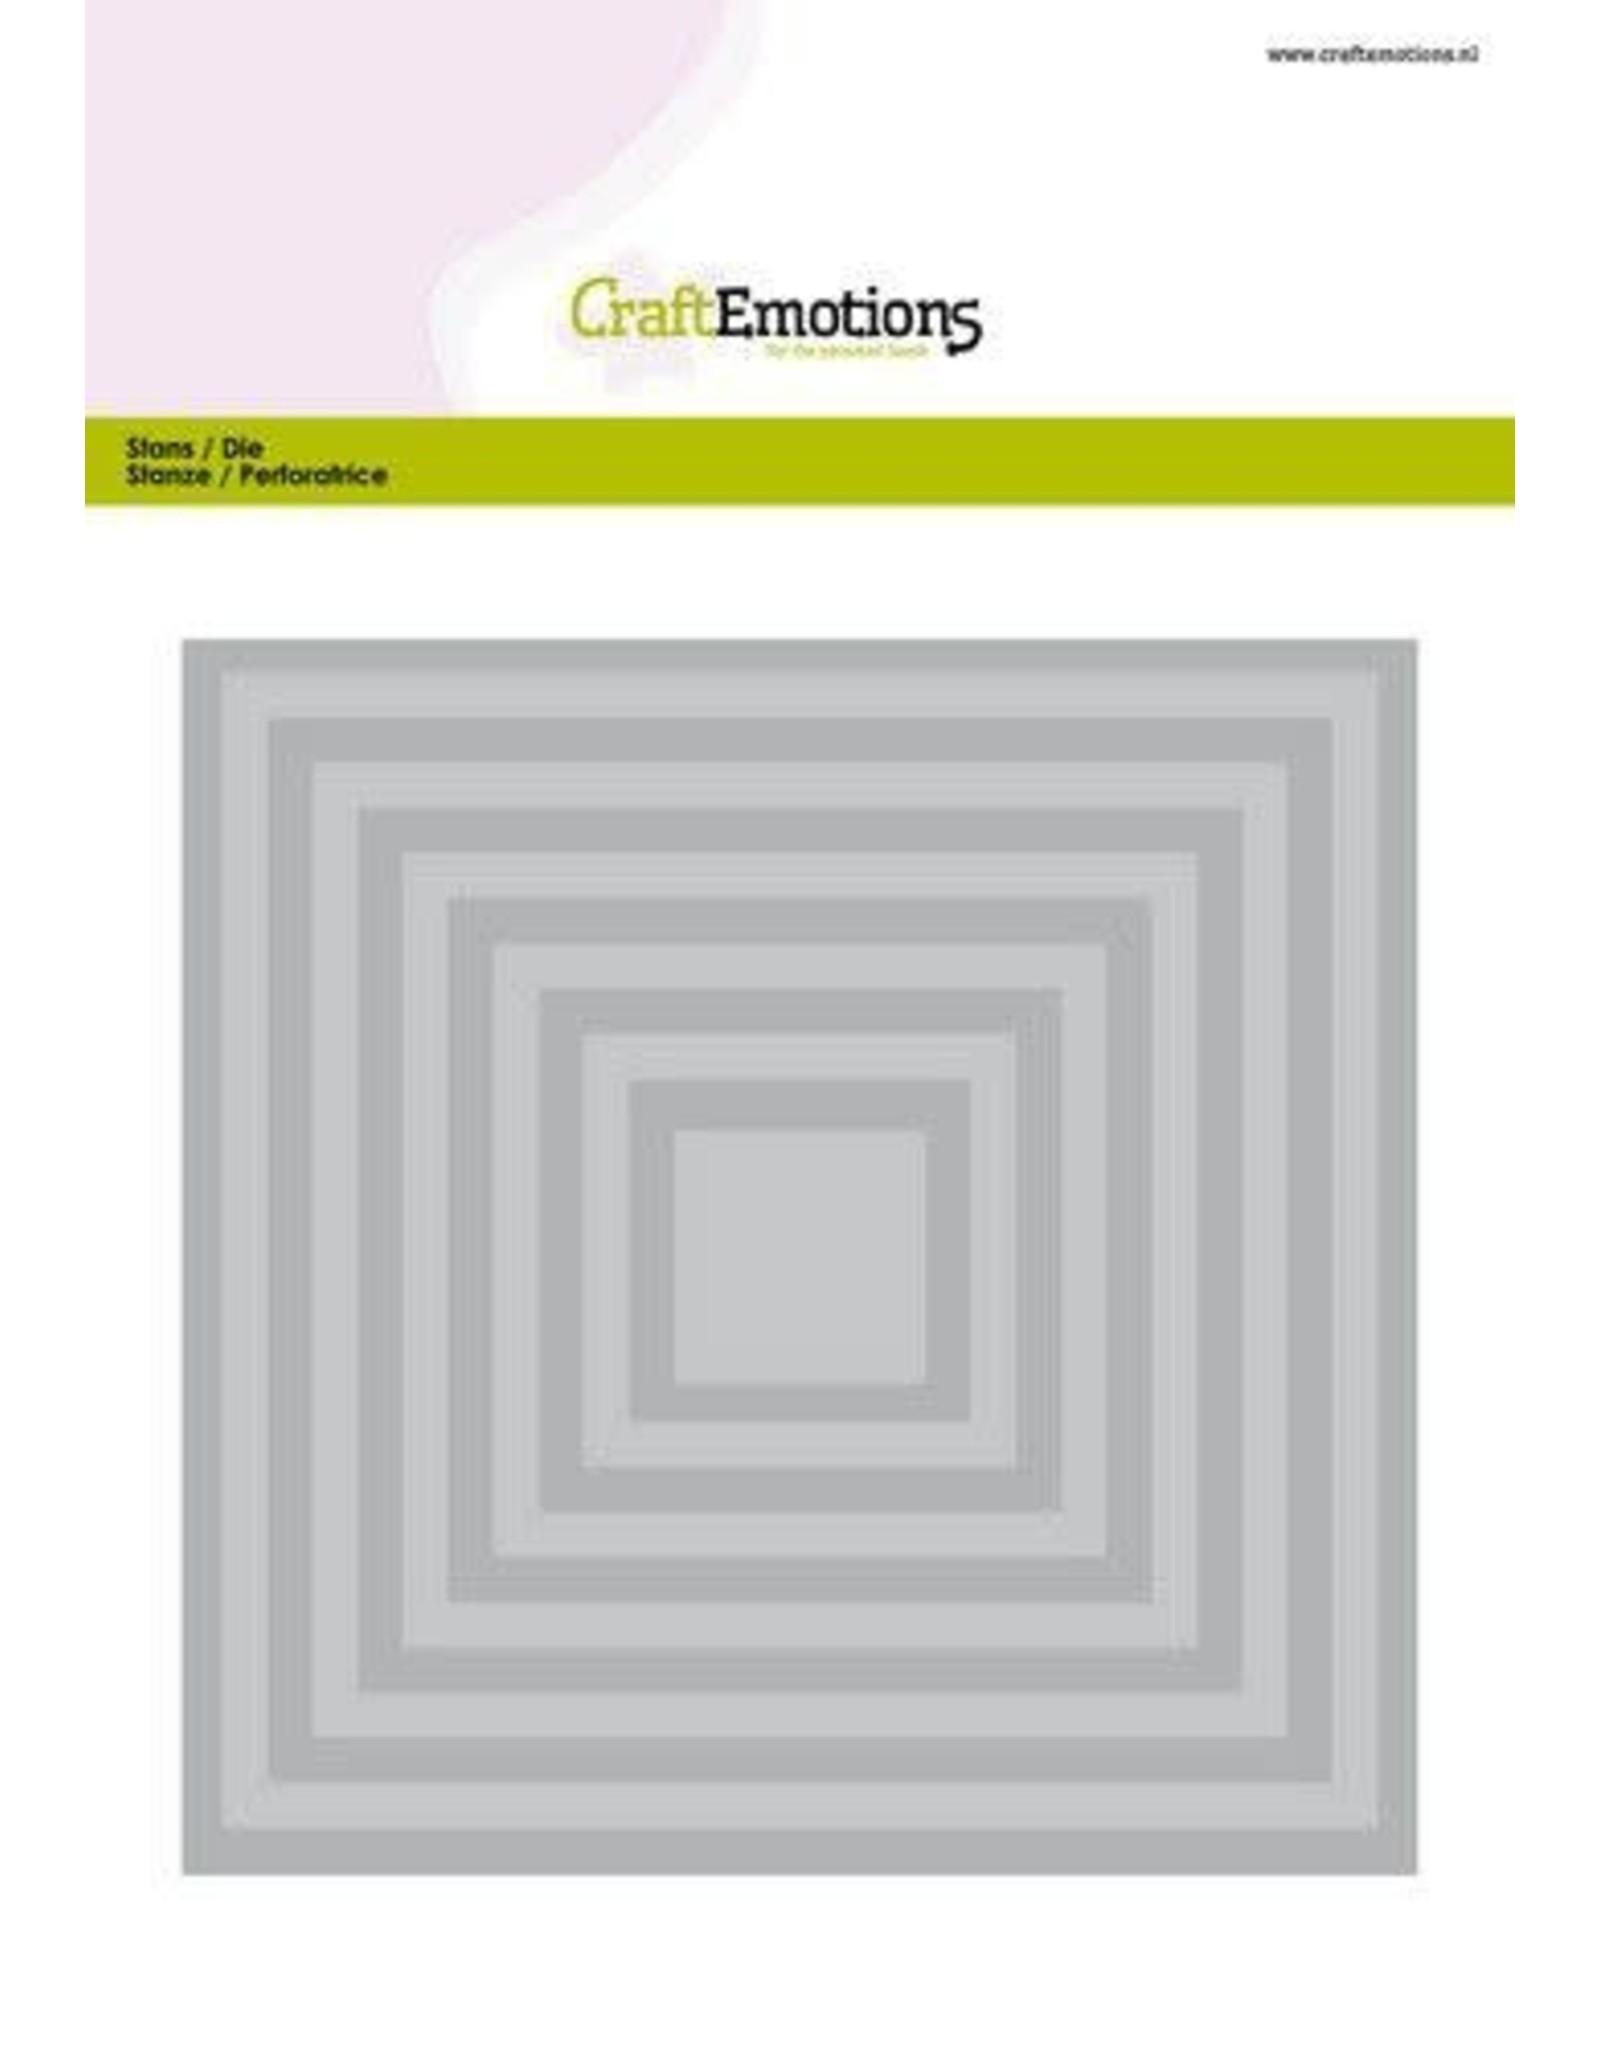 Craft Emotions CraftEmotions Big Nesting Die - vierkanten Card 150x160 - 6,6-15,0cm